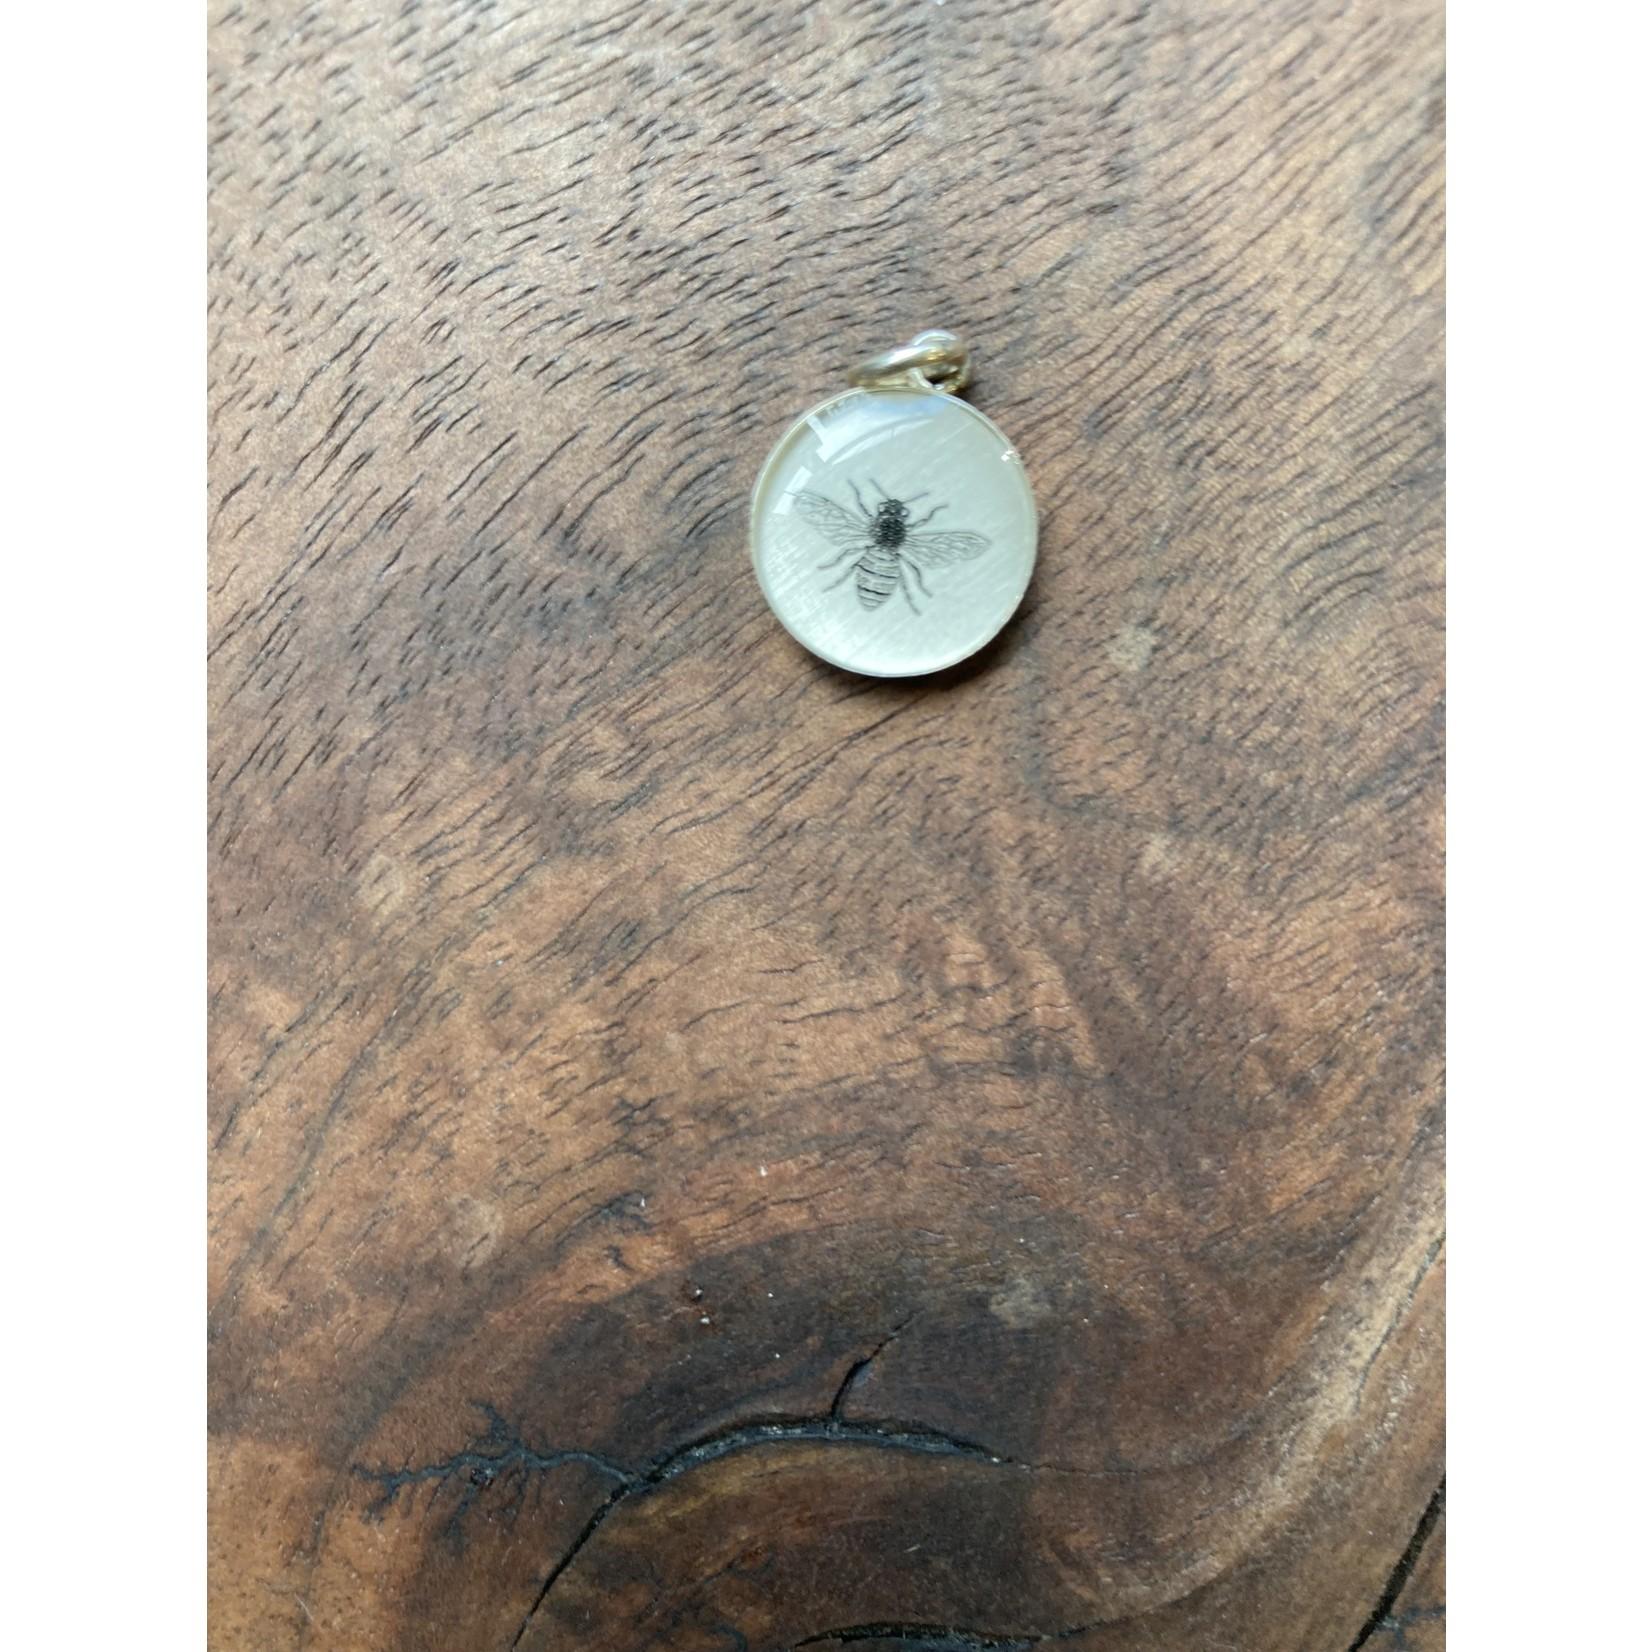 Everyday Artifacts Everyday Artifacts | Bee 12mm SS Bezel Pendant